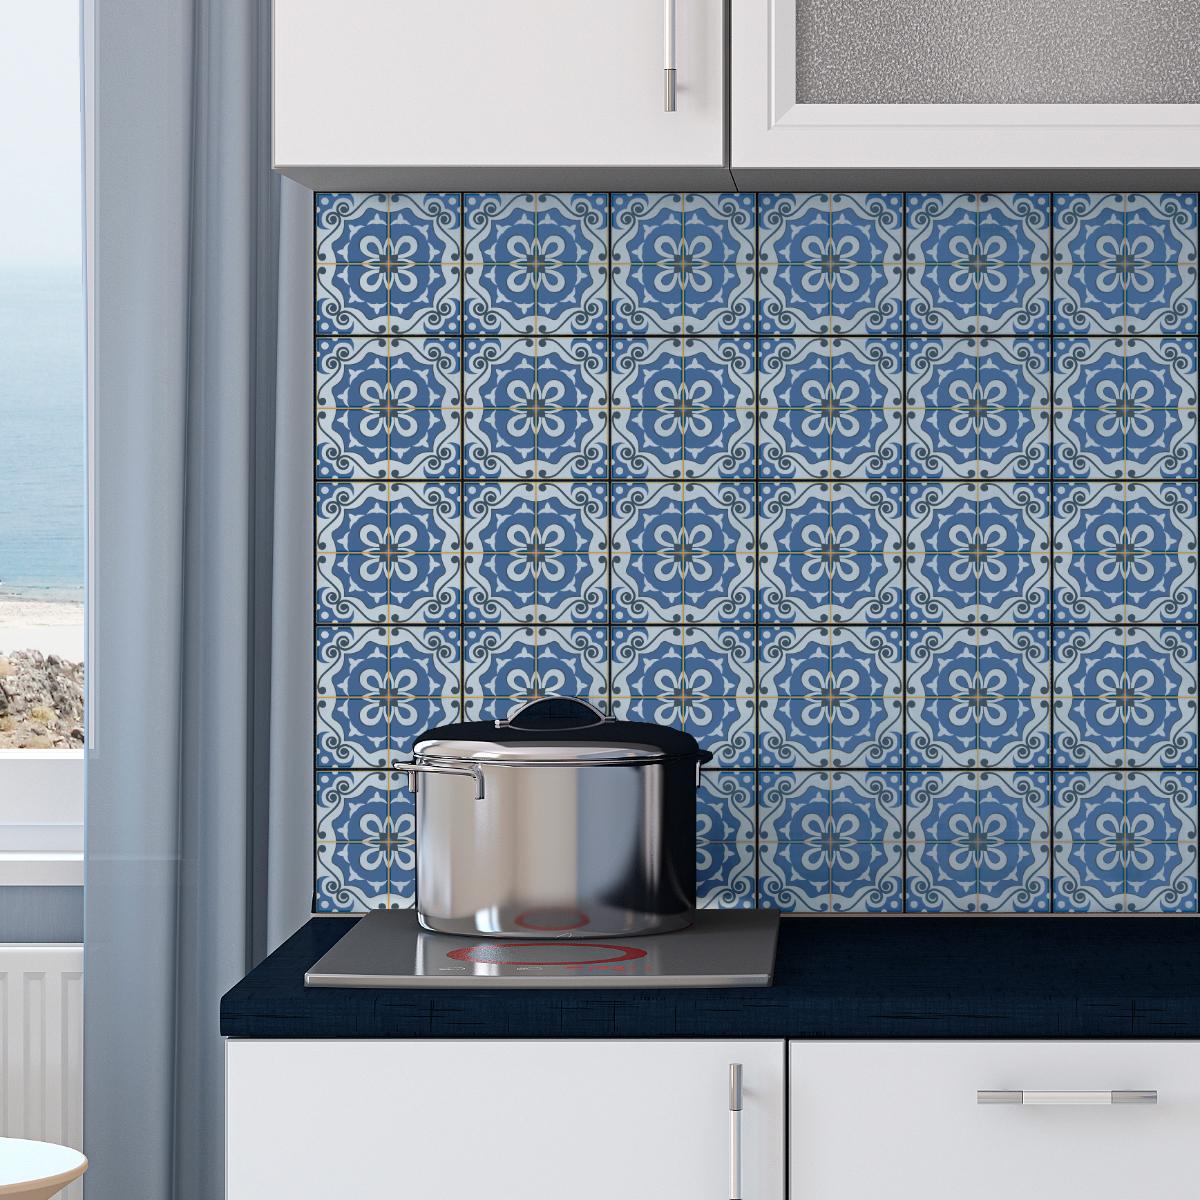 30 stickers carrelages azulejos imelda salle de bain et wc salle de bain ambiance sticker. Black Bedroom Furniture Sets. Home Design Ideas